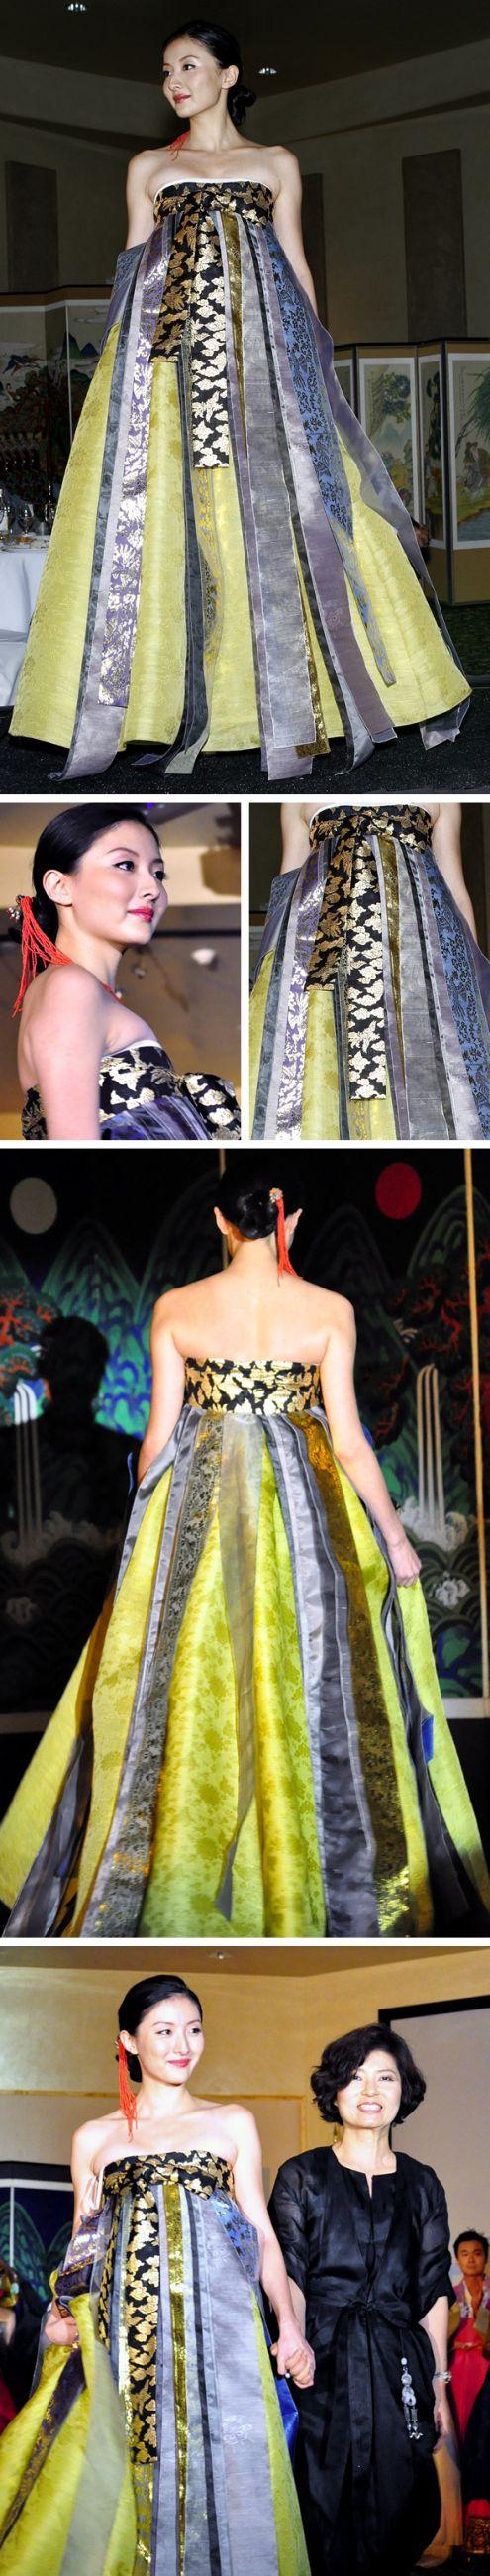 _MG_7041_a. Kim MeHee hanbok couture